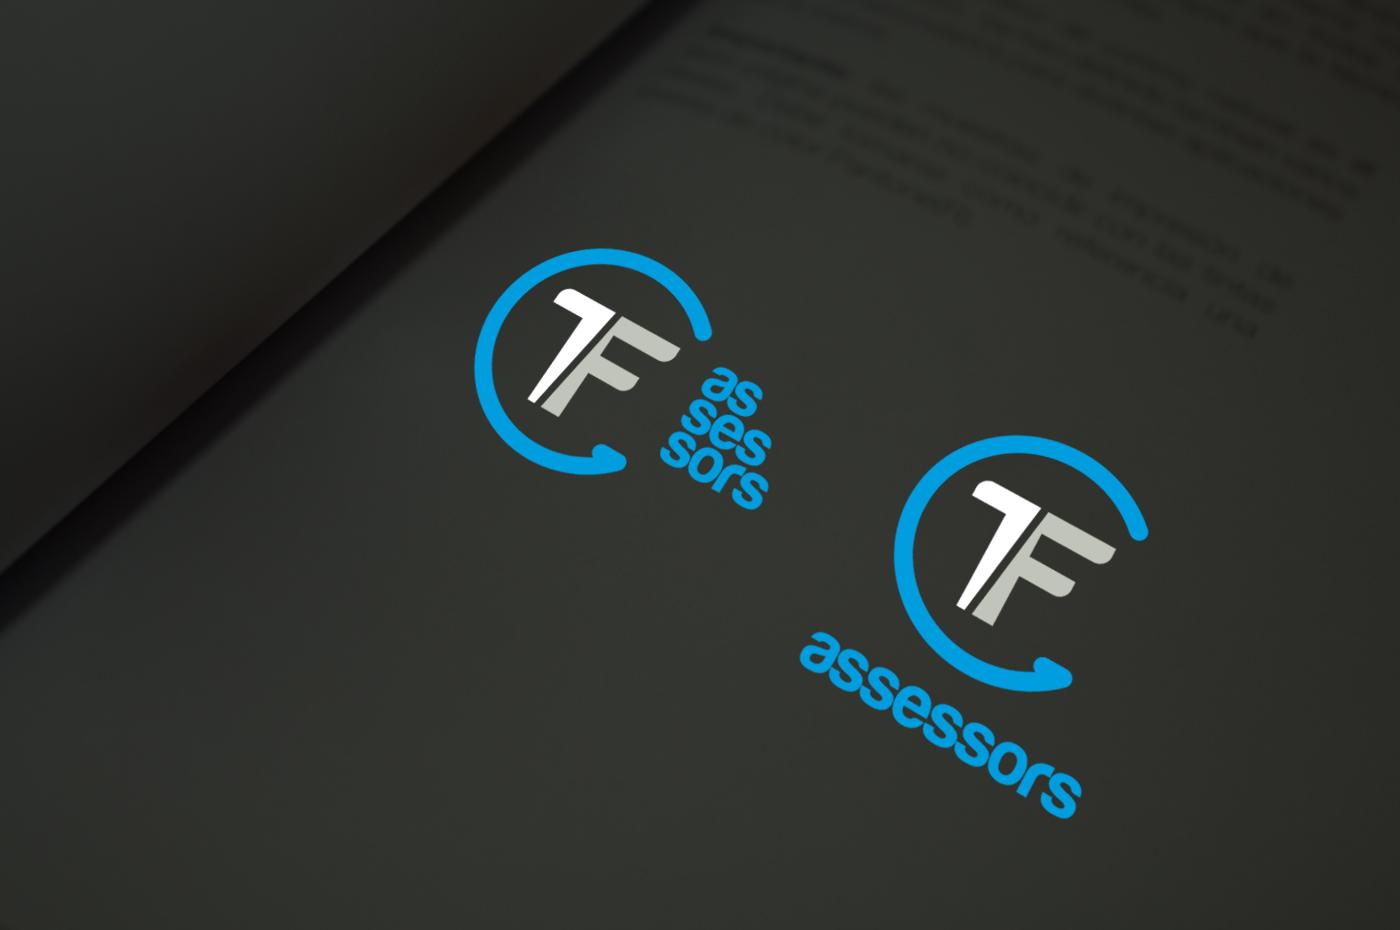 TF-ASSESSORS-fons-gris-corporatiu